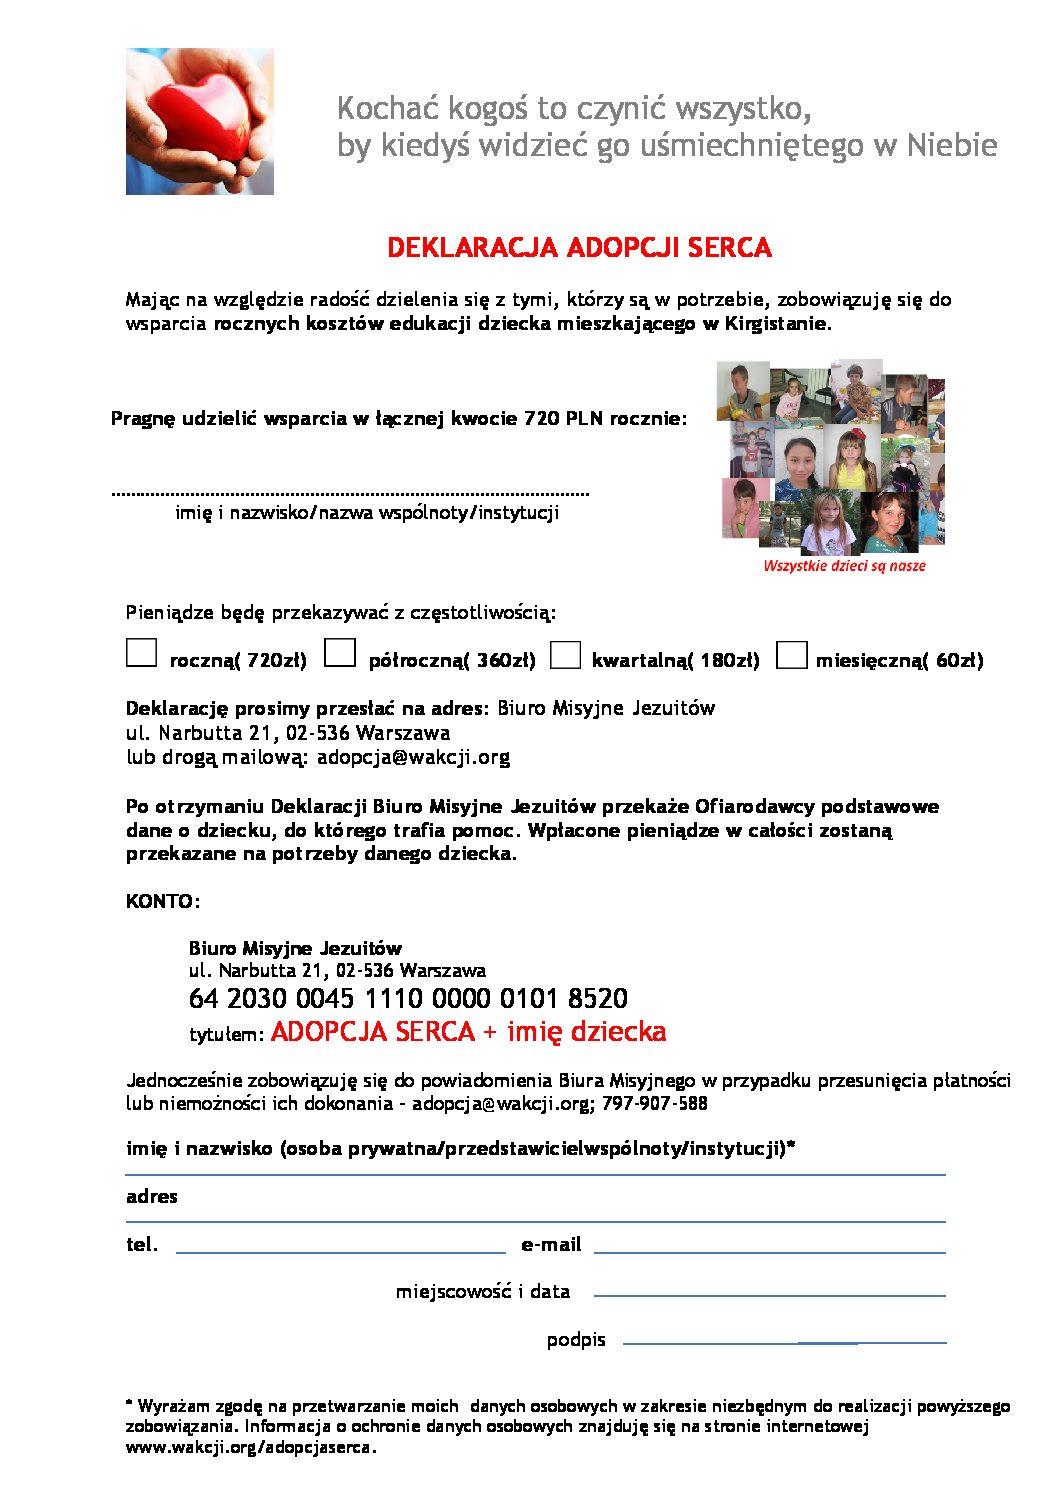 Deklaracja-Adopcji-Serca